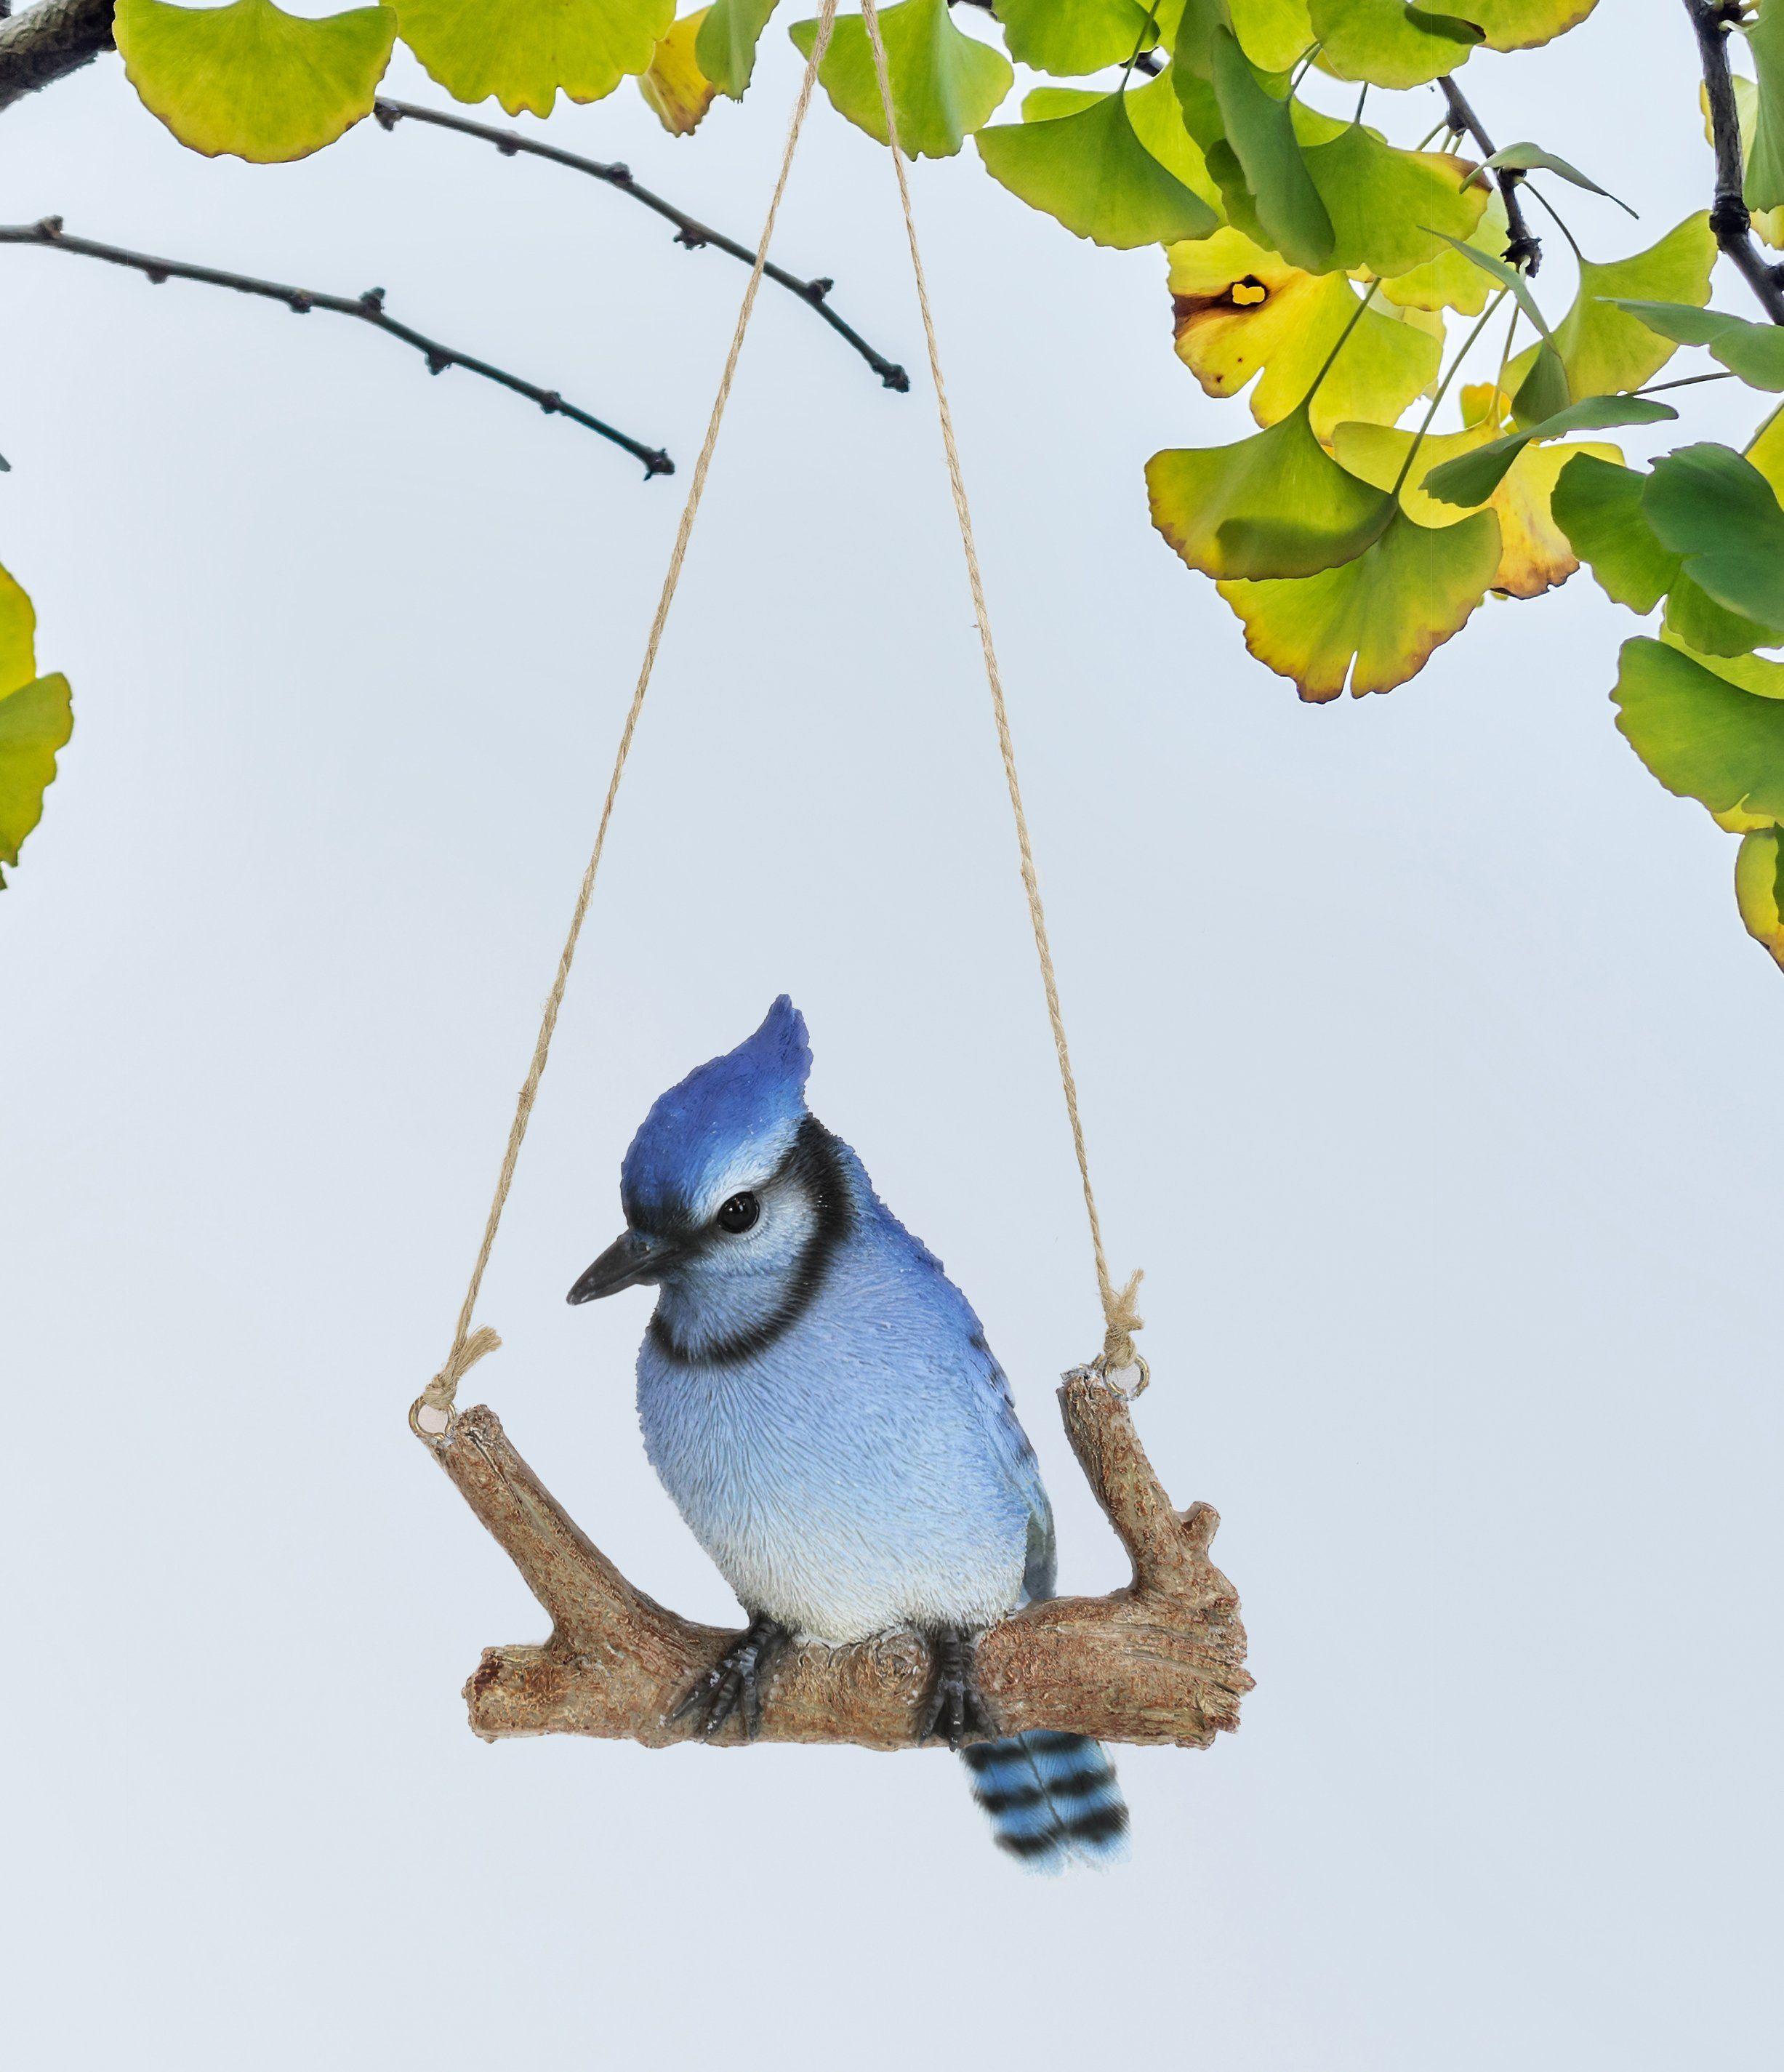 Home Garden Hanging Blue Jay Passerine Bird Perching On Branch Figurine Decor In 2021 Blue Jay Bird Jay Bird Blue Jay